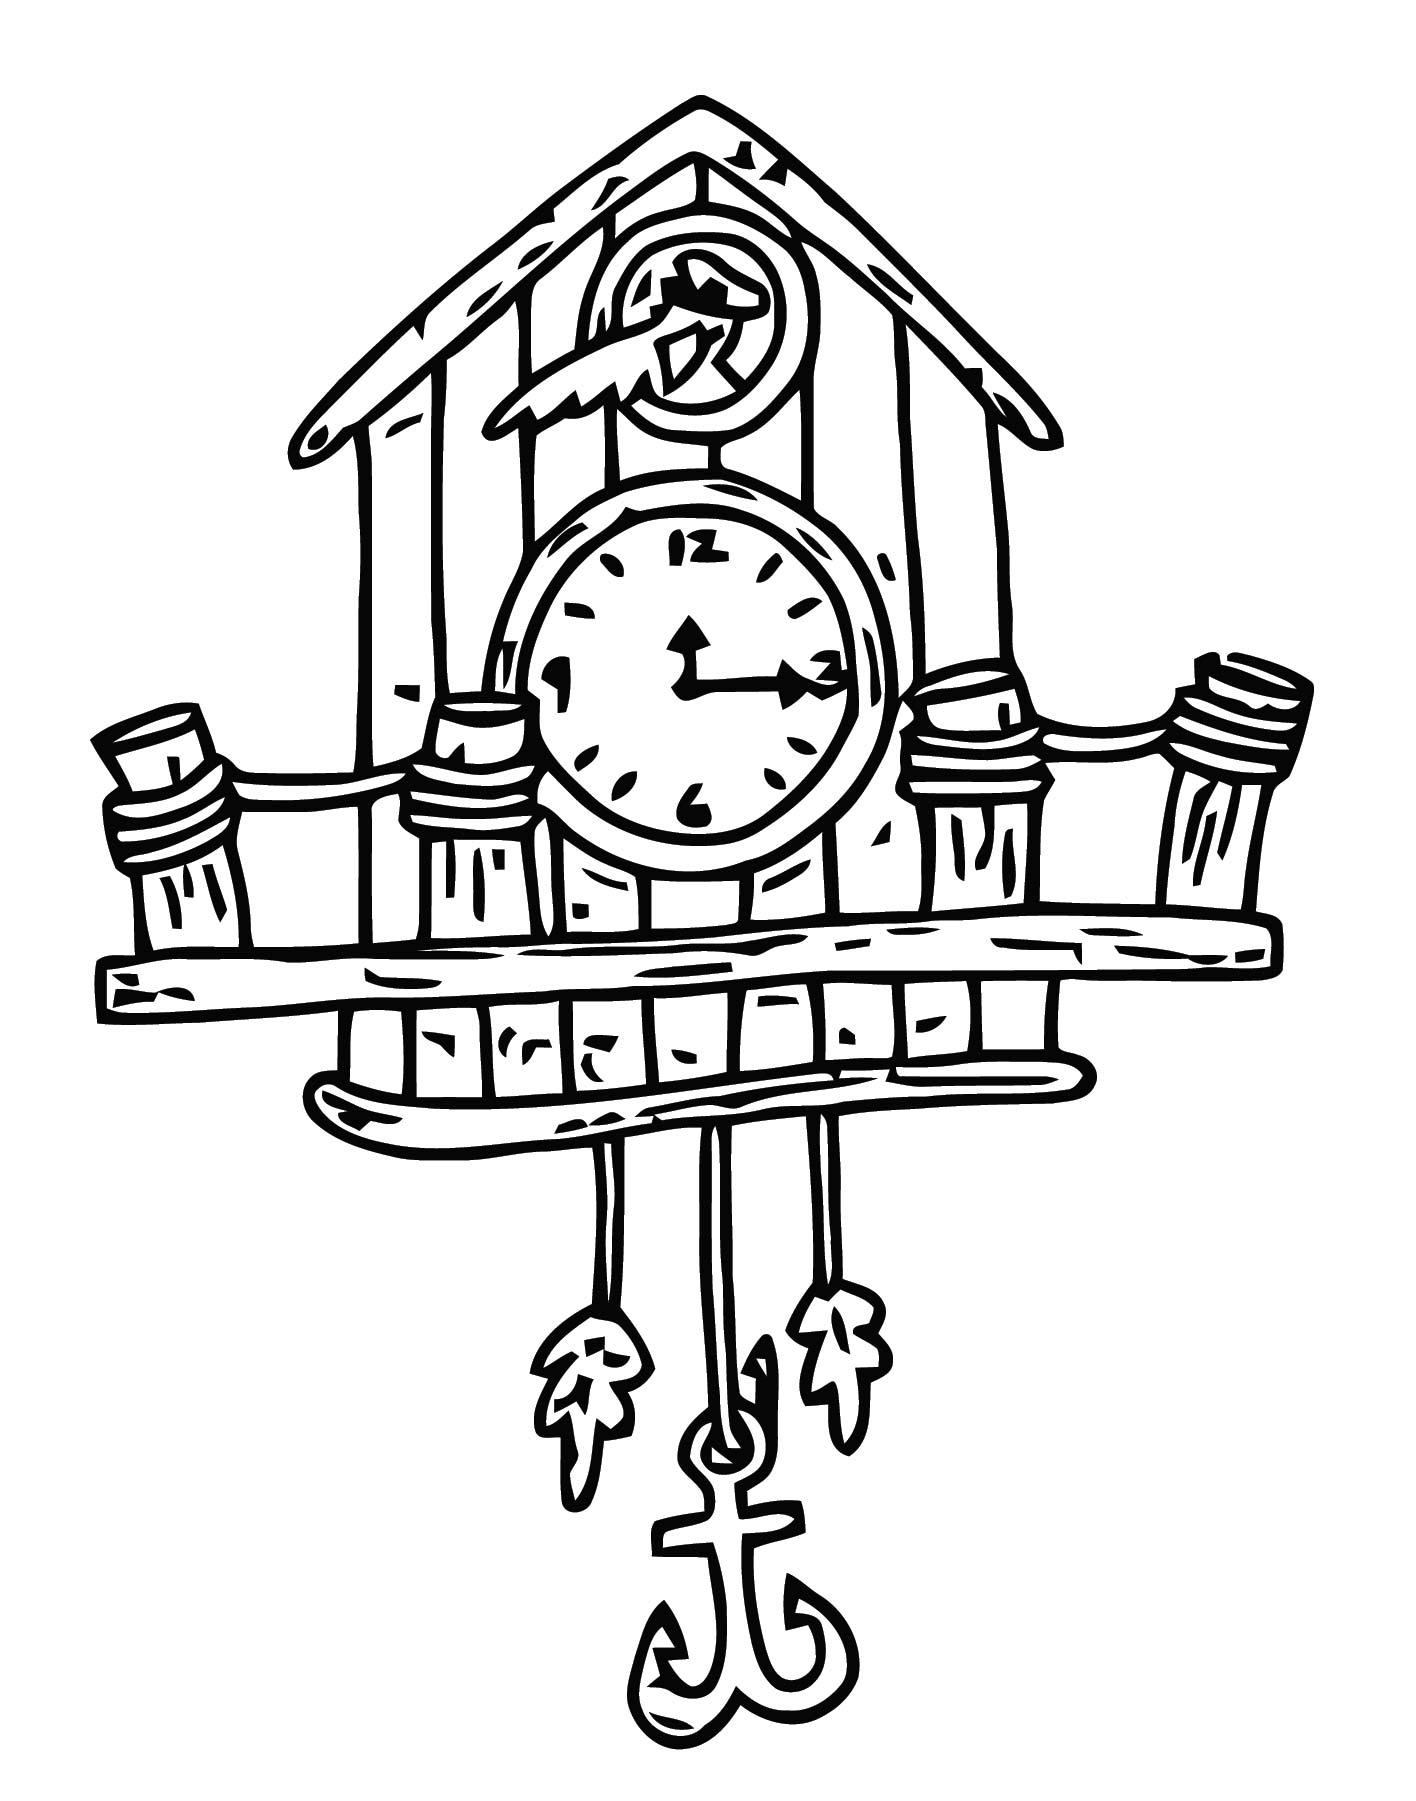 Cuckoo Clock Clip Art 4446 Free Printable 11 Cartoonized Free Printable Coloring Page